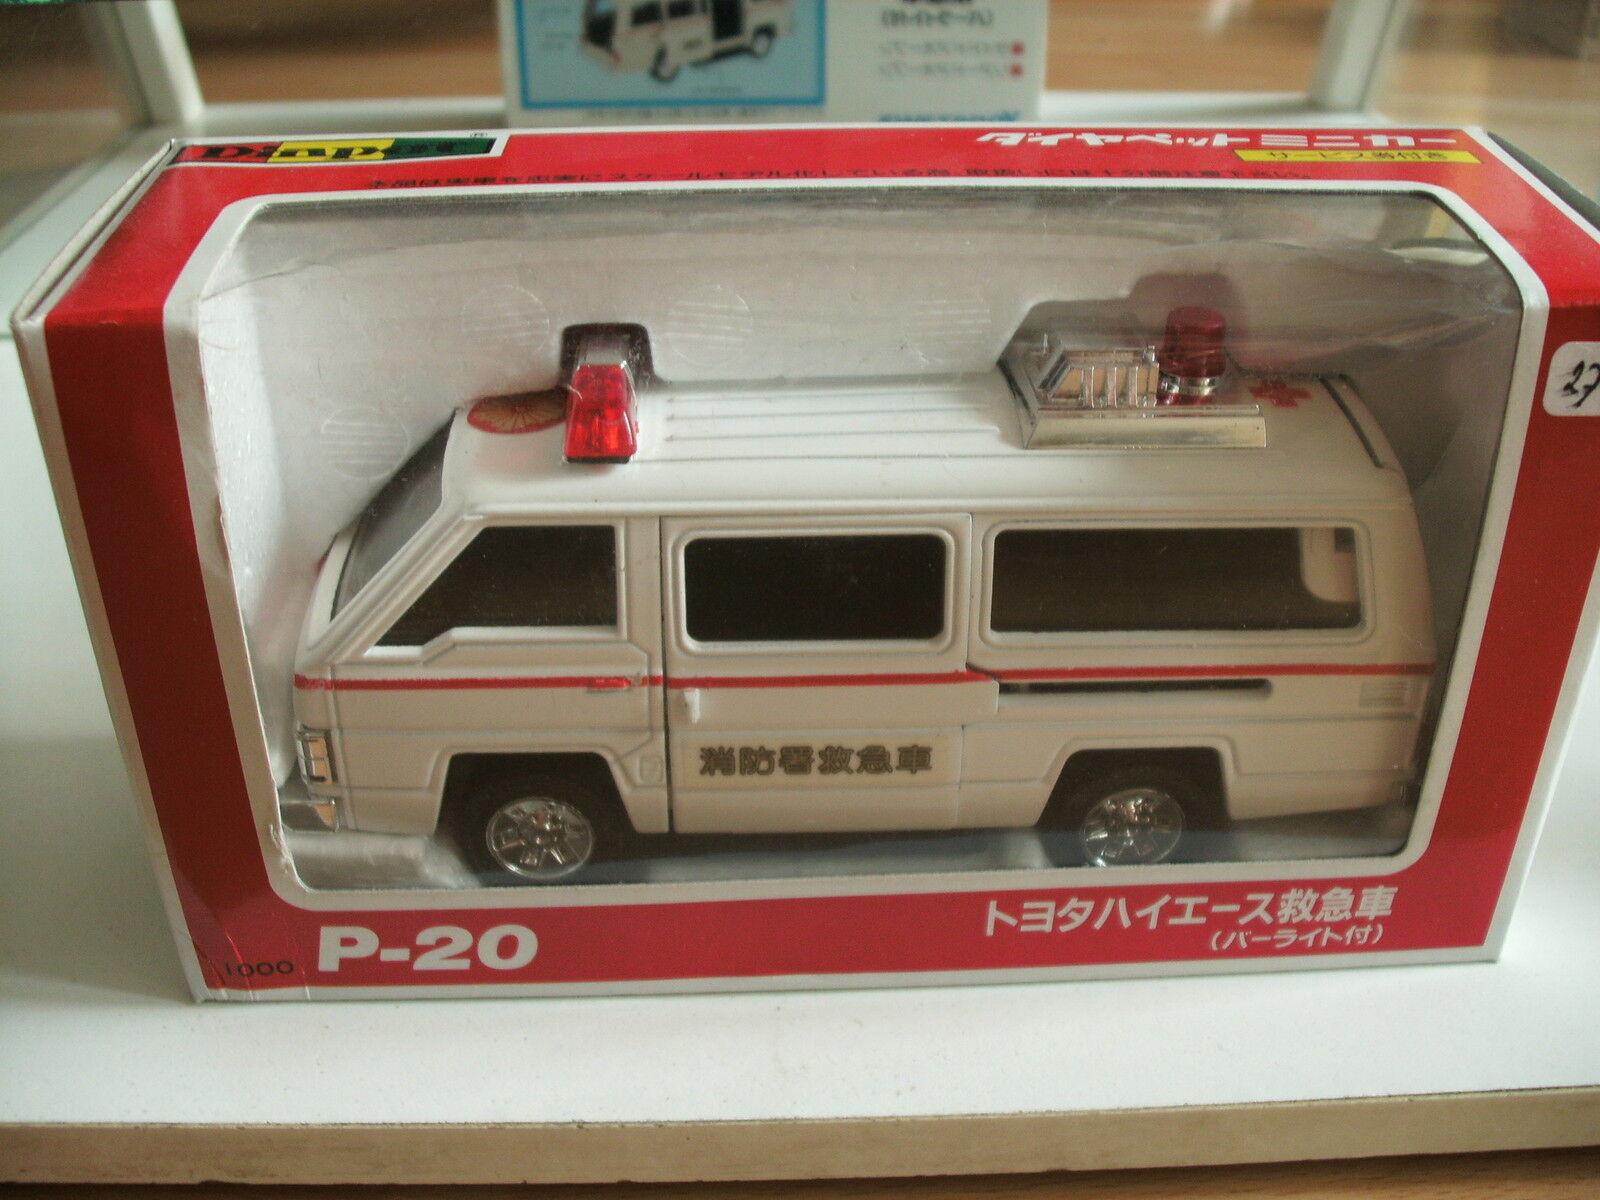 Yonezawa Diapet Toyota Hi-Ace Ambulance in White on 1 35 in Box